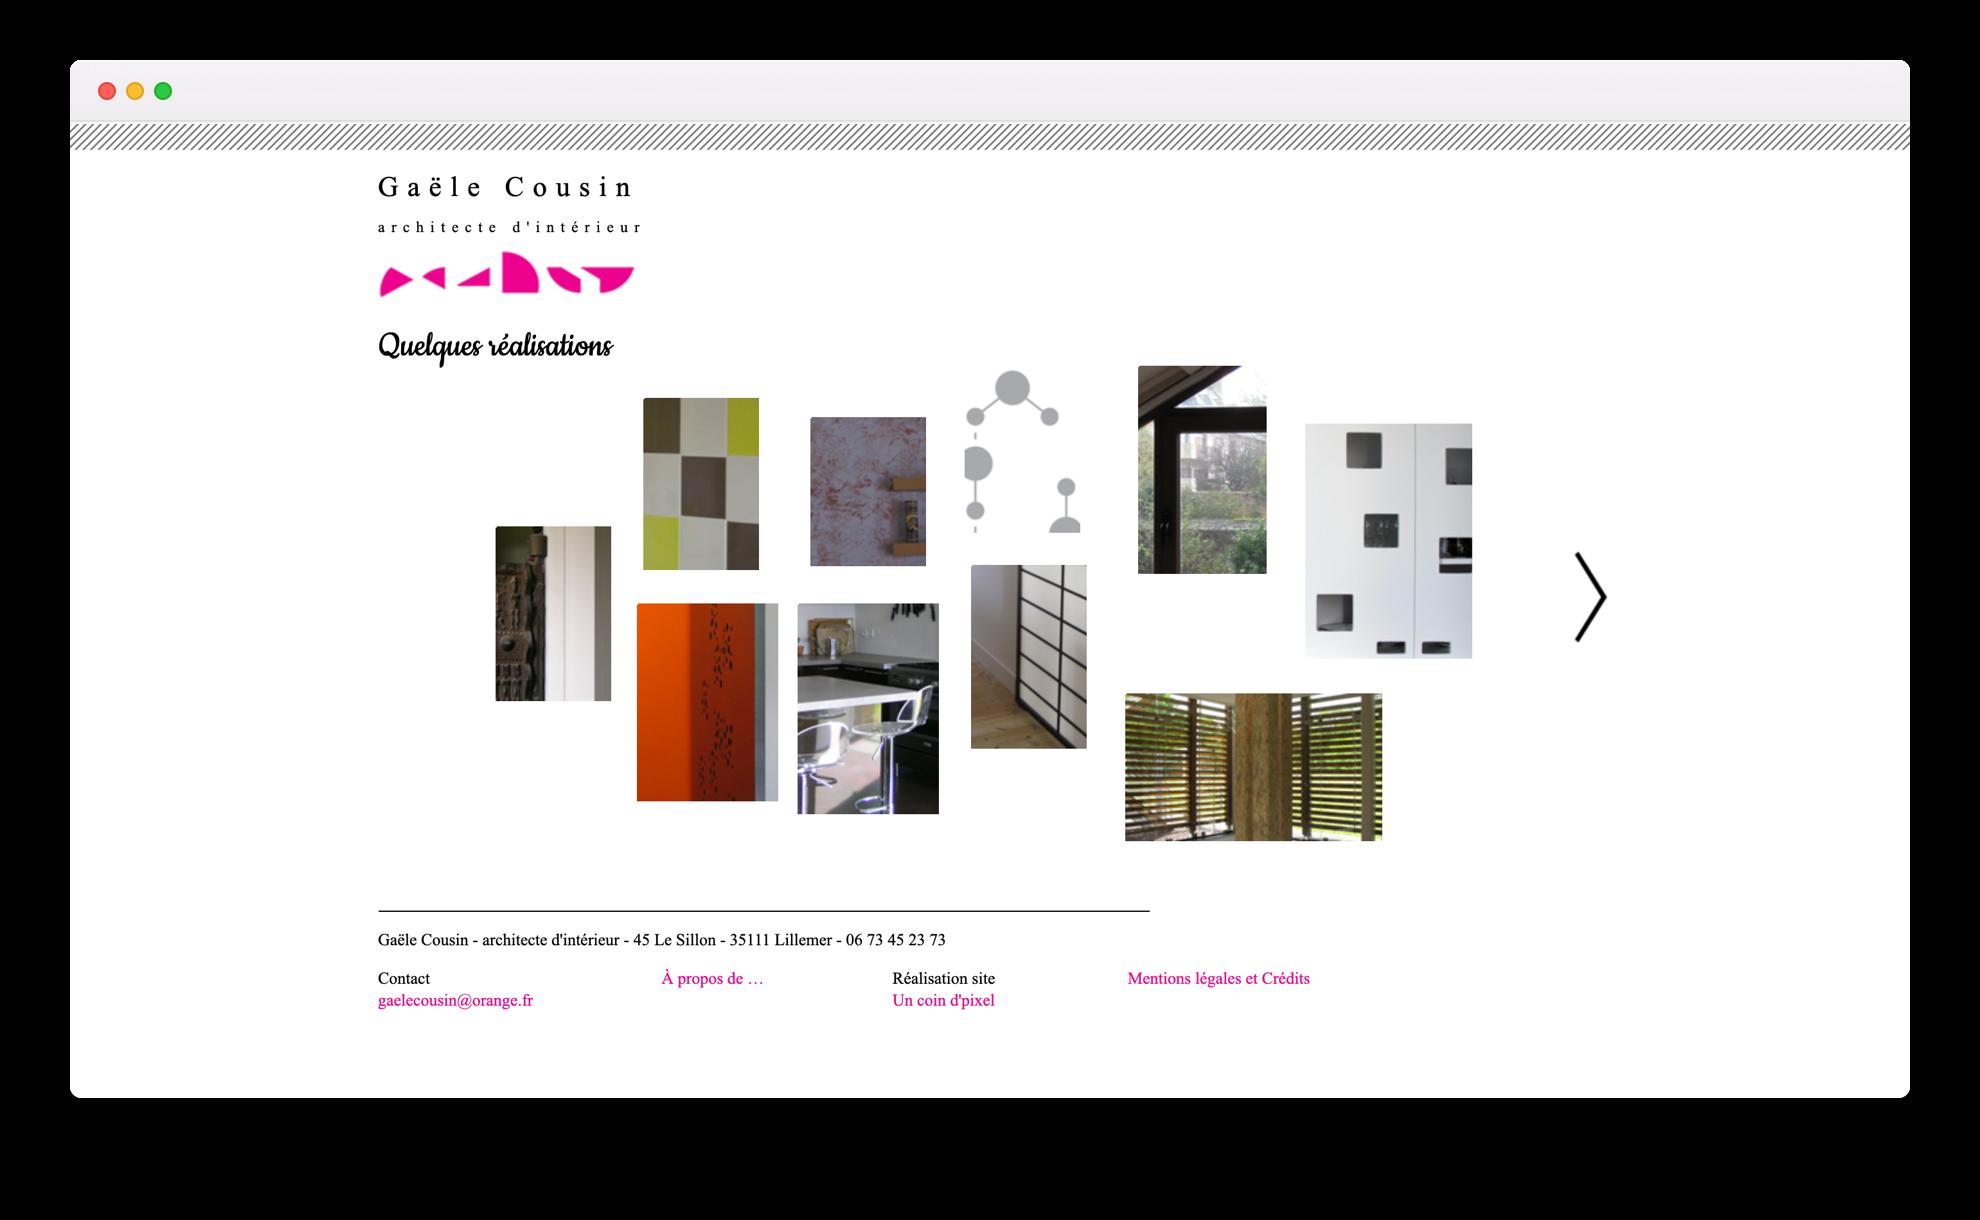 Gaële Cousin - Webdesign